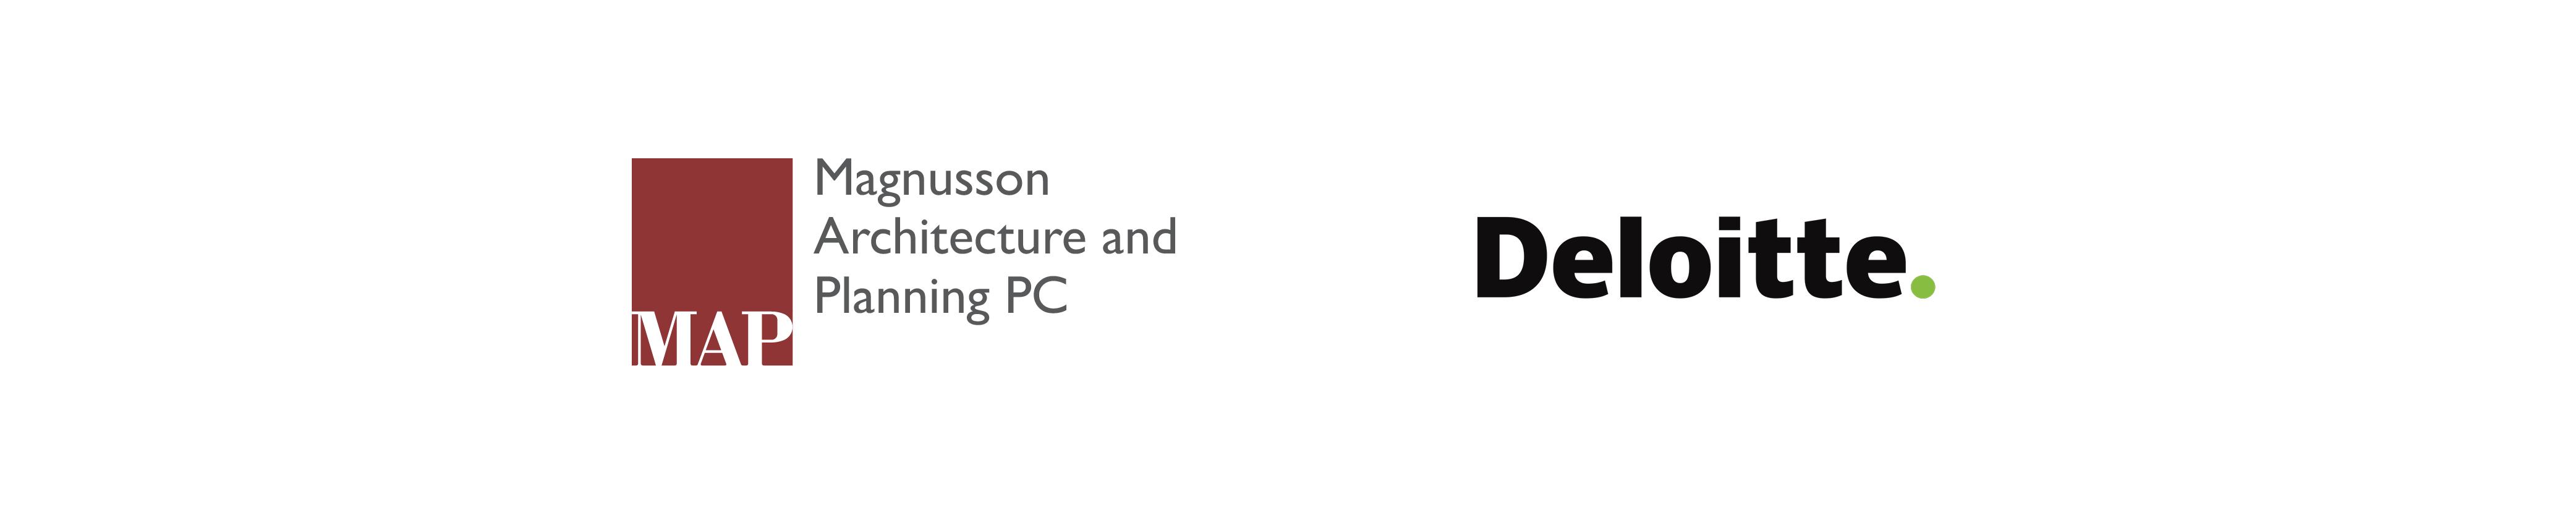 MAP and Deloitte logos